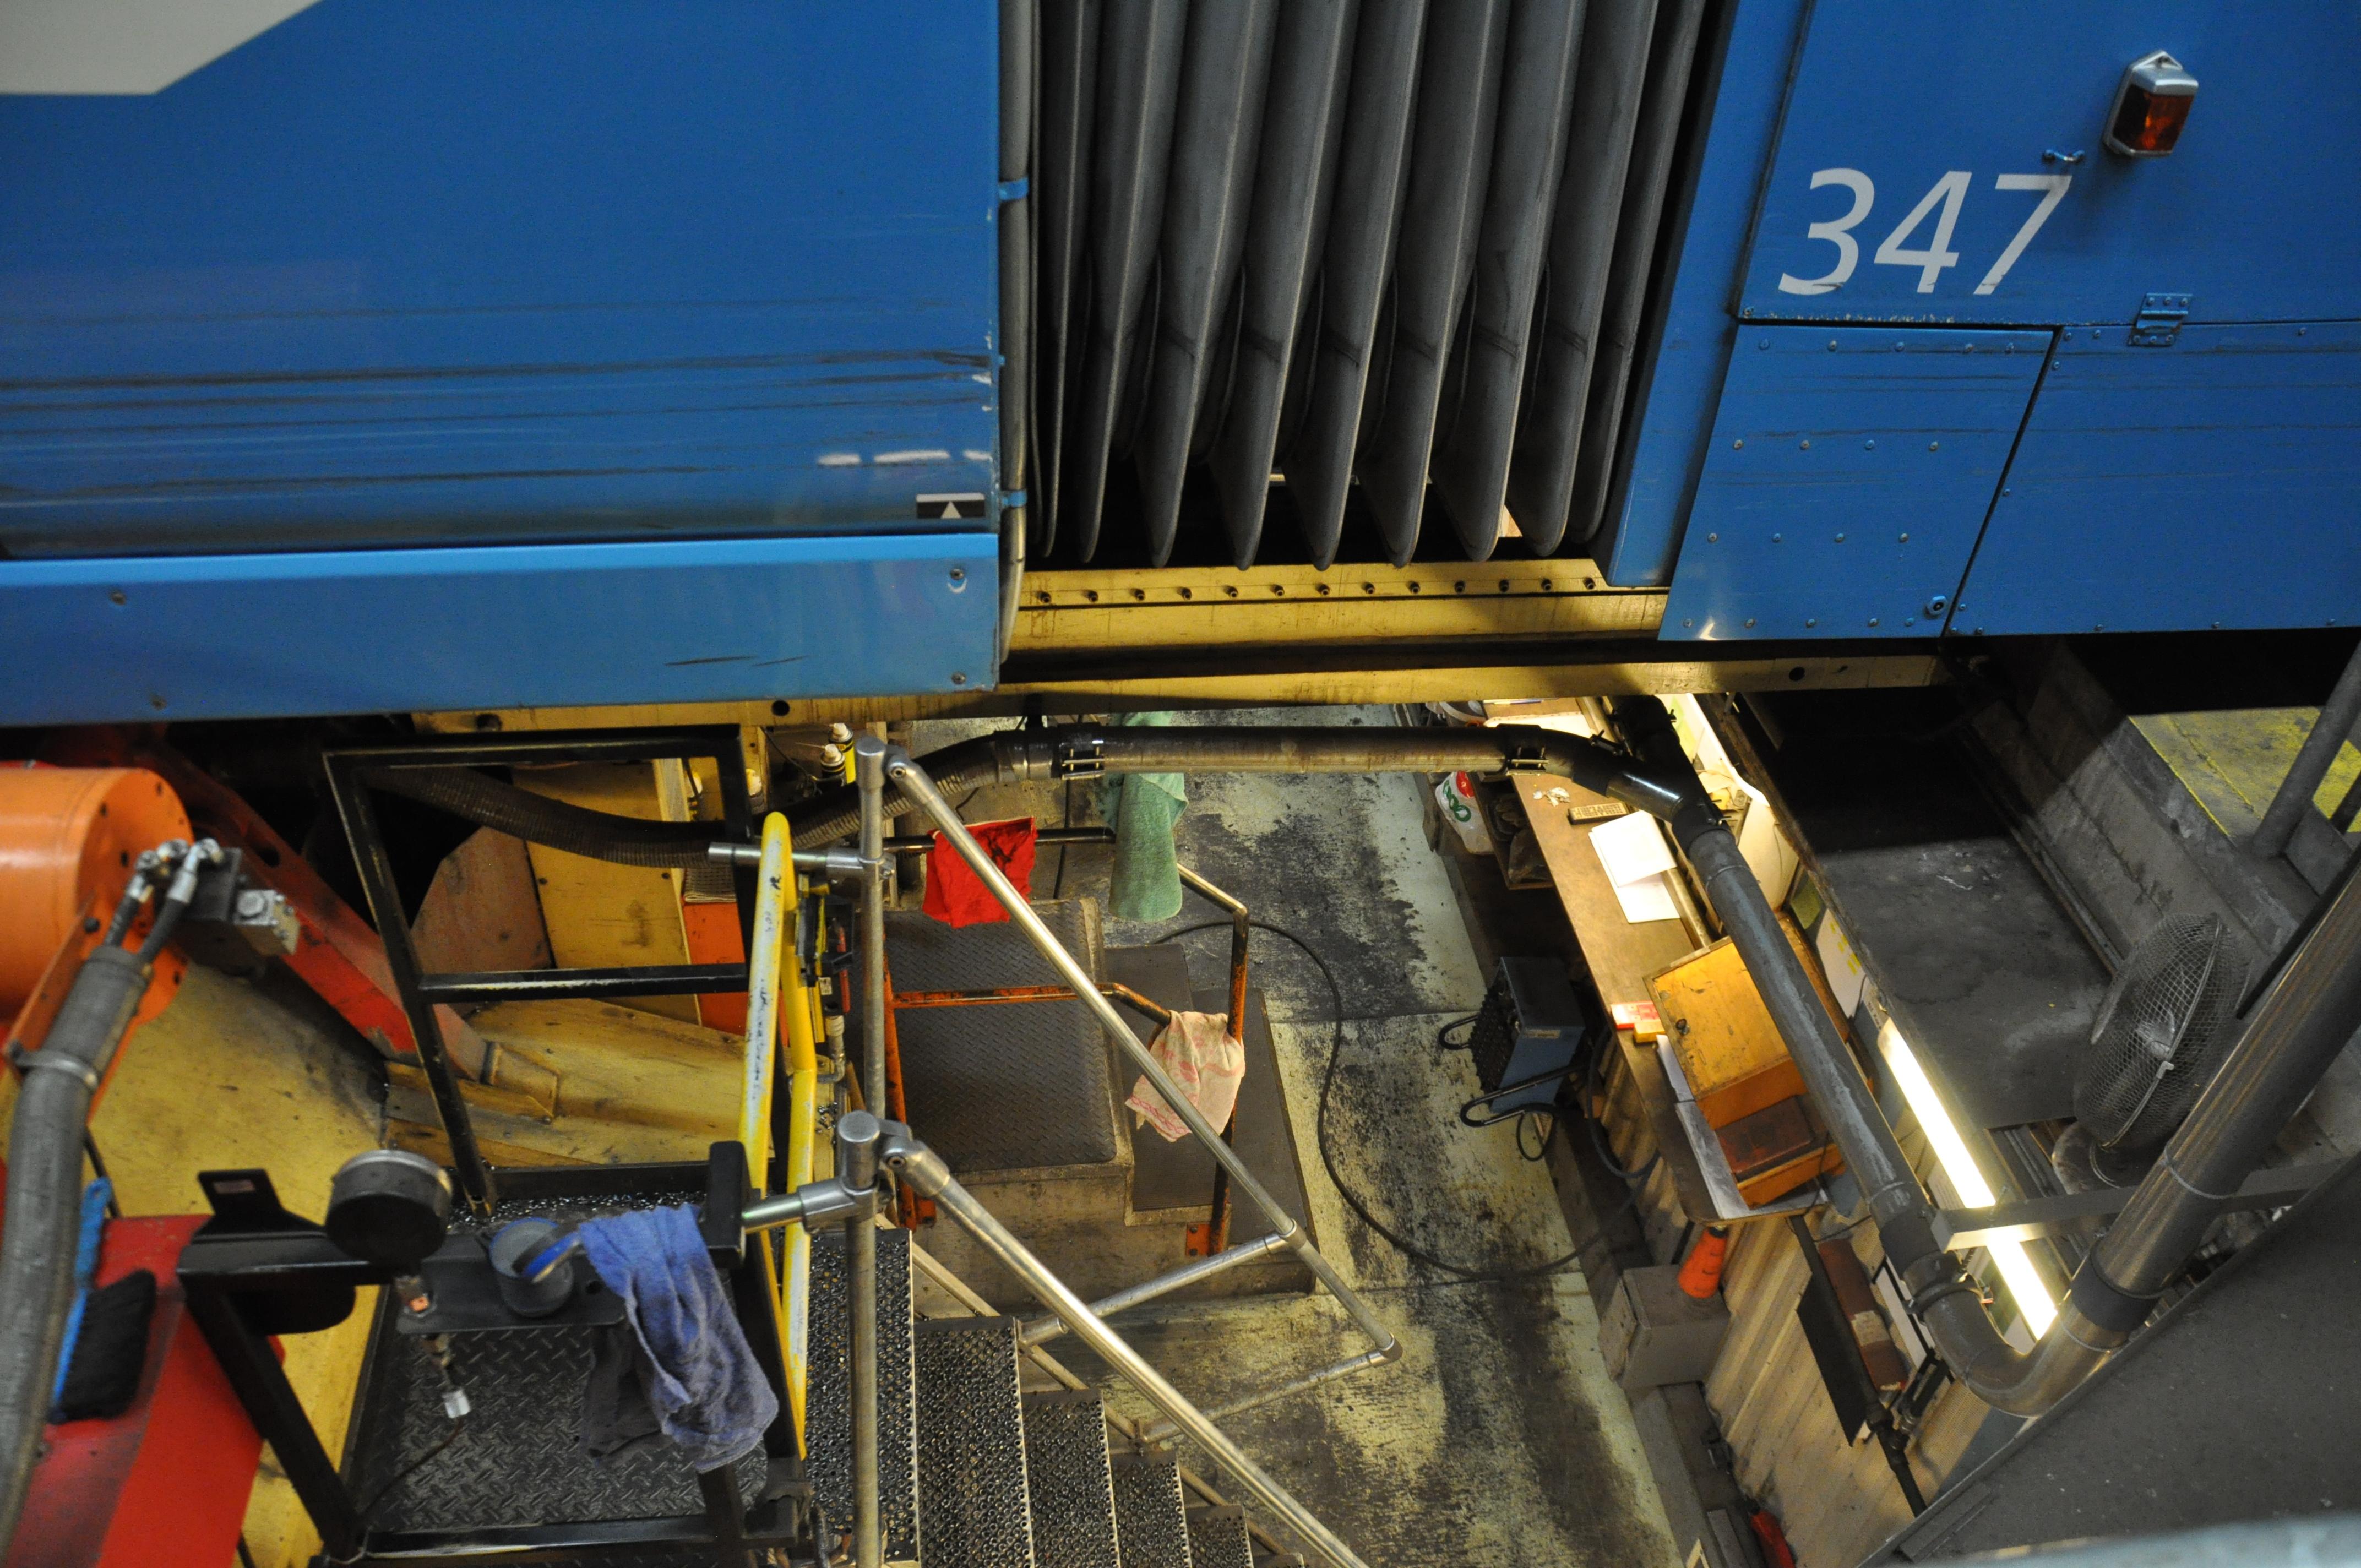 Deppigt att aka sparvagn i goteborg